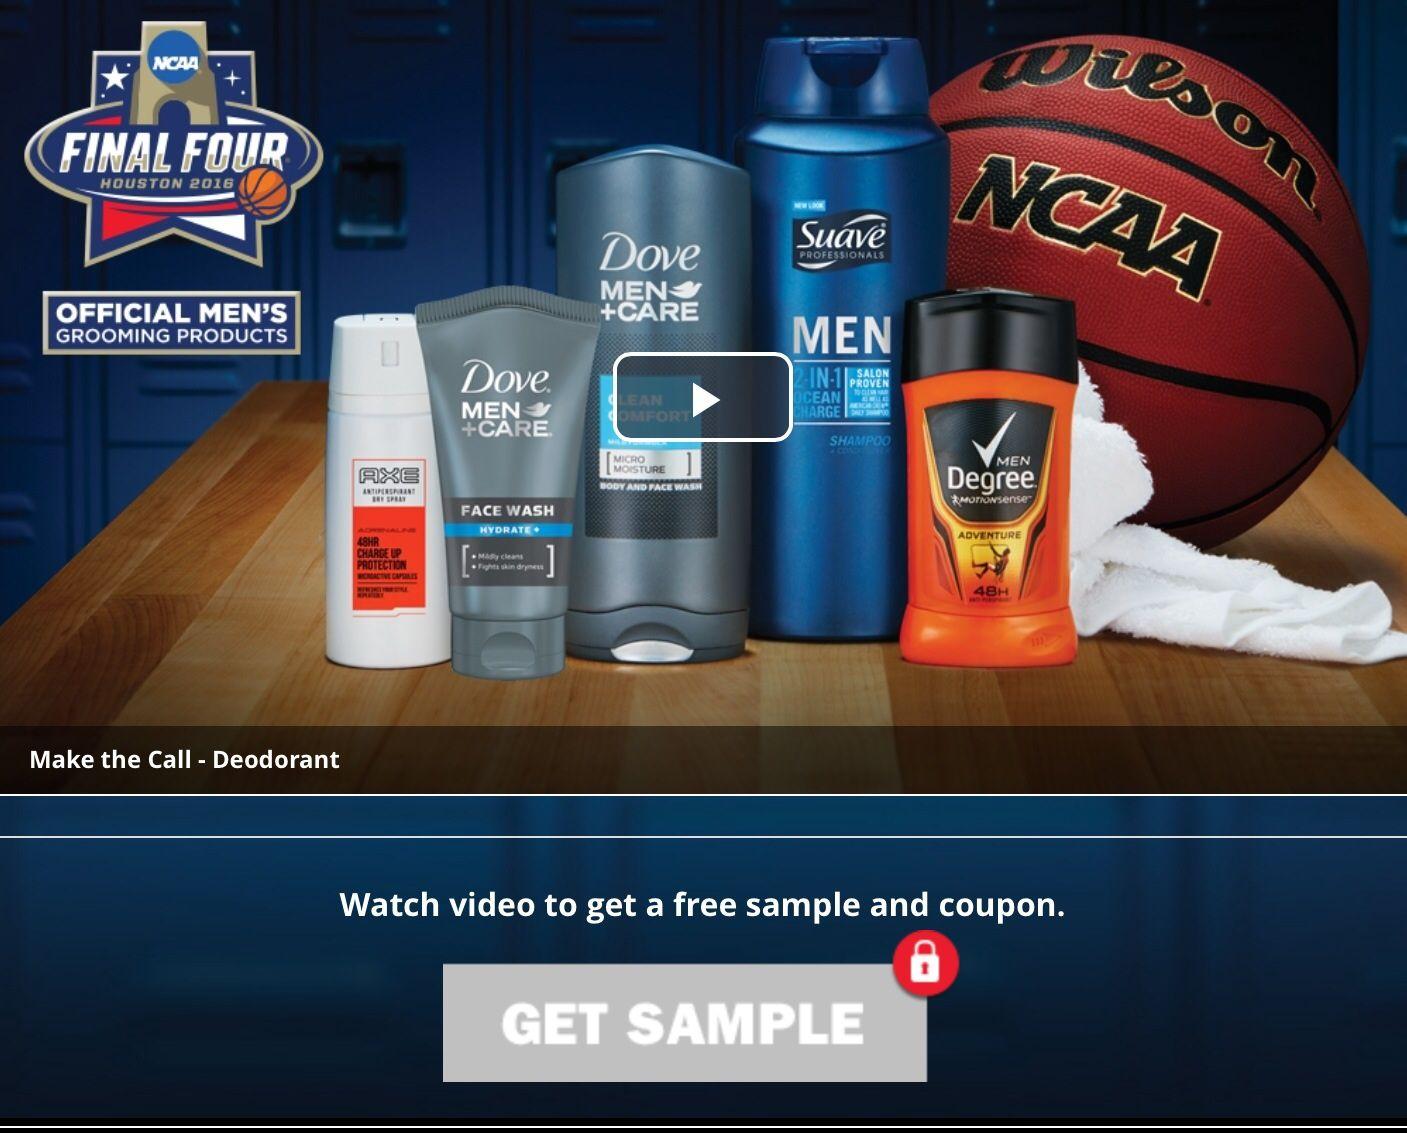 Free Dove Men Care Sensitive Shield Body Wash And Axe Dark Deodorant Bodyspray Score 150 Ml Twin Pack Sample Of Temptation